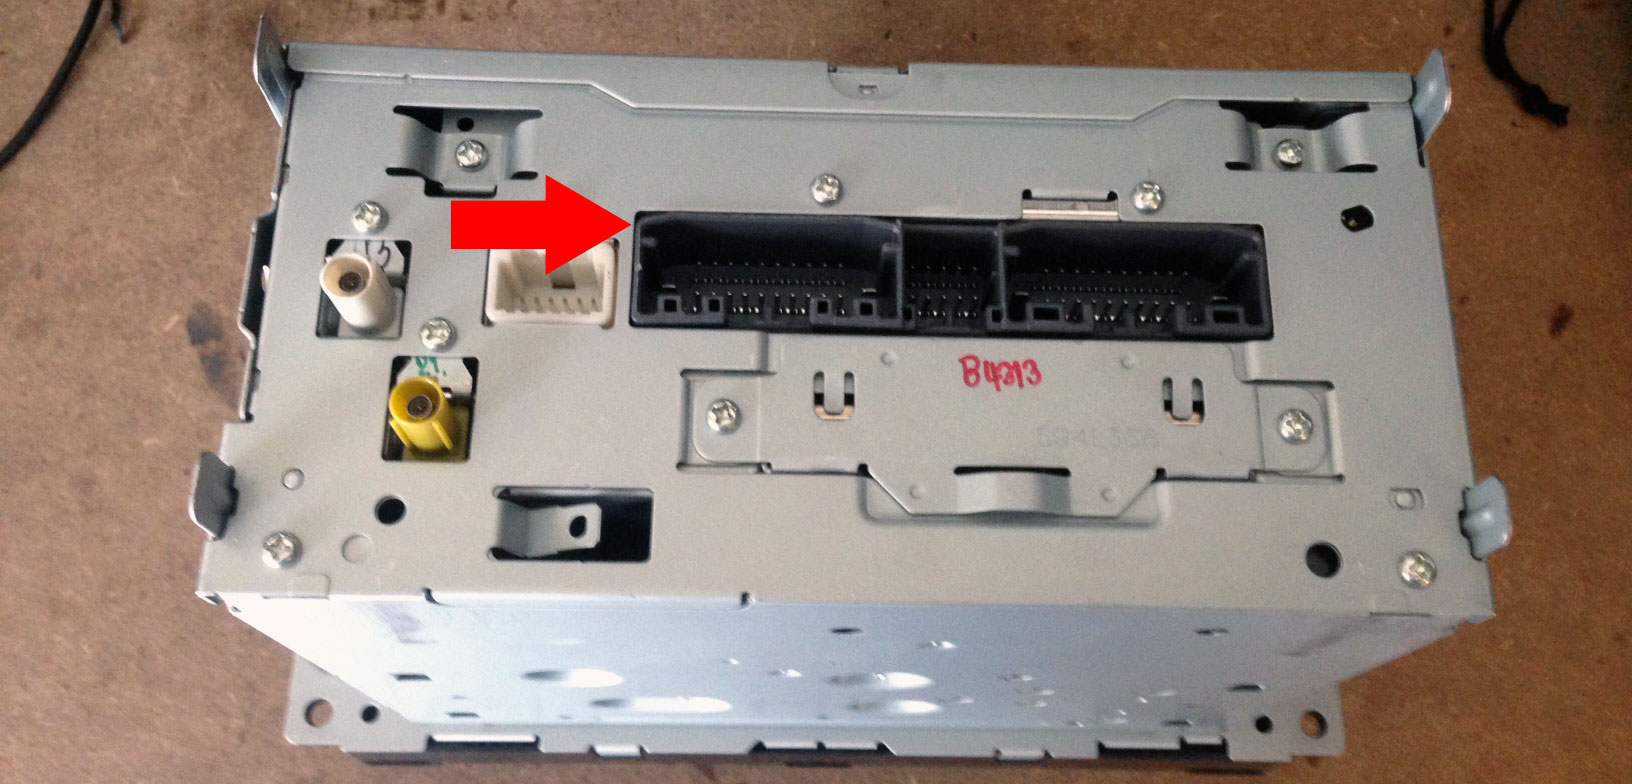 uconnect multimedia wiring diagram xg 7235  uconnect multimedia wiring diagram wiring diagram  uconnect multimedia wiring diagram